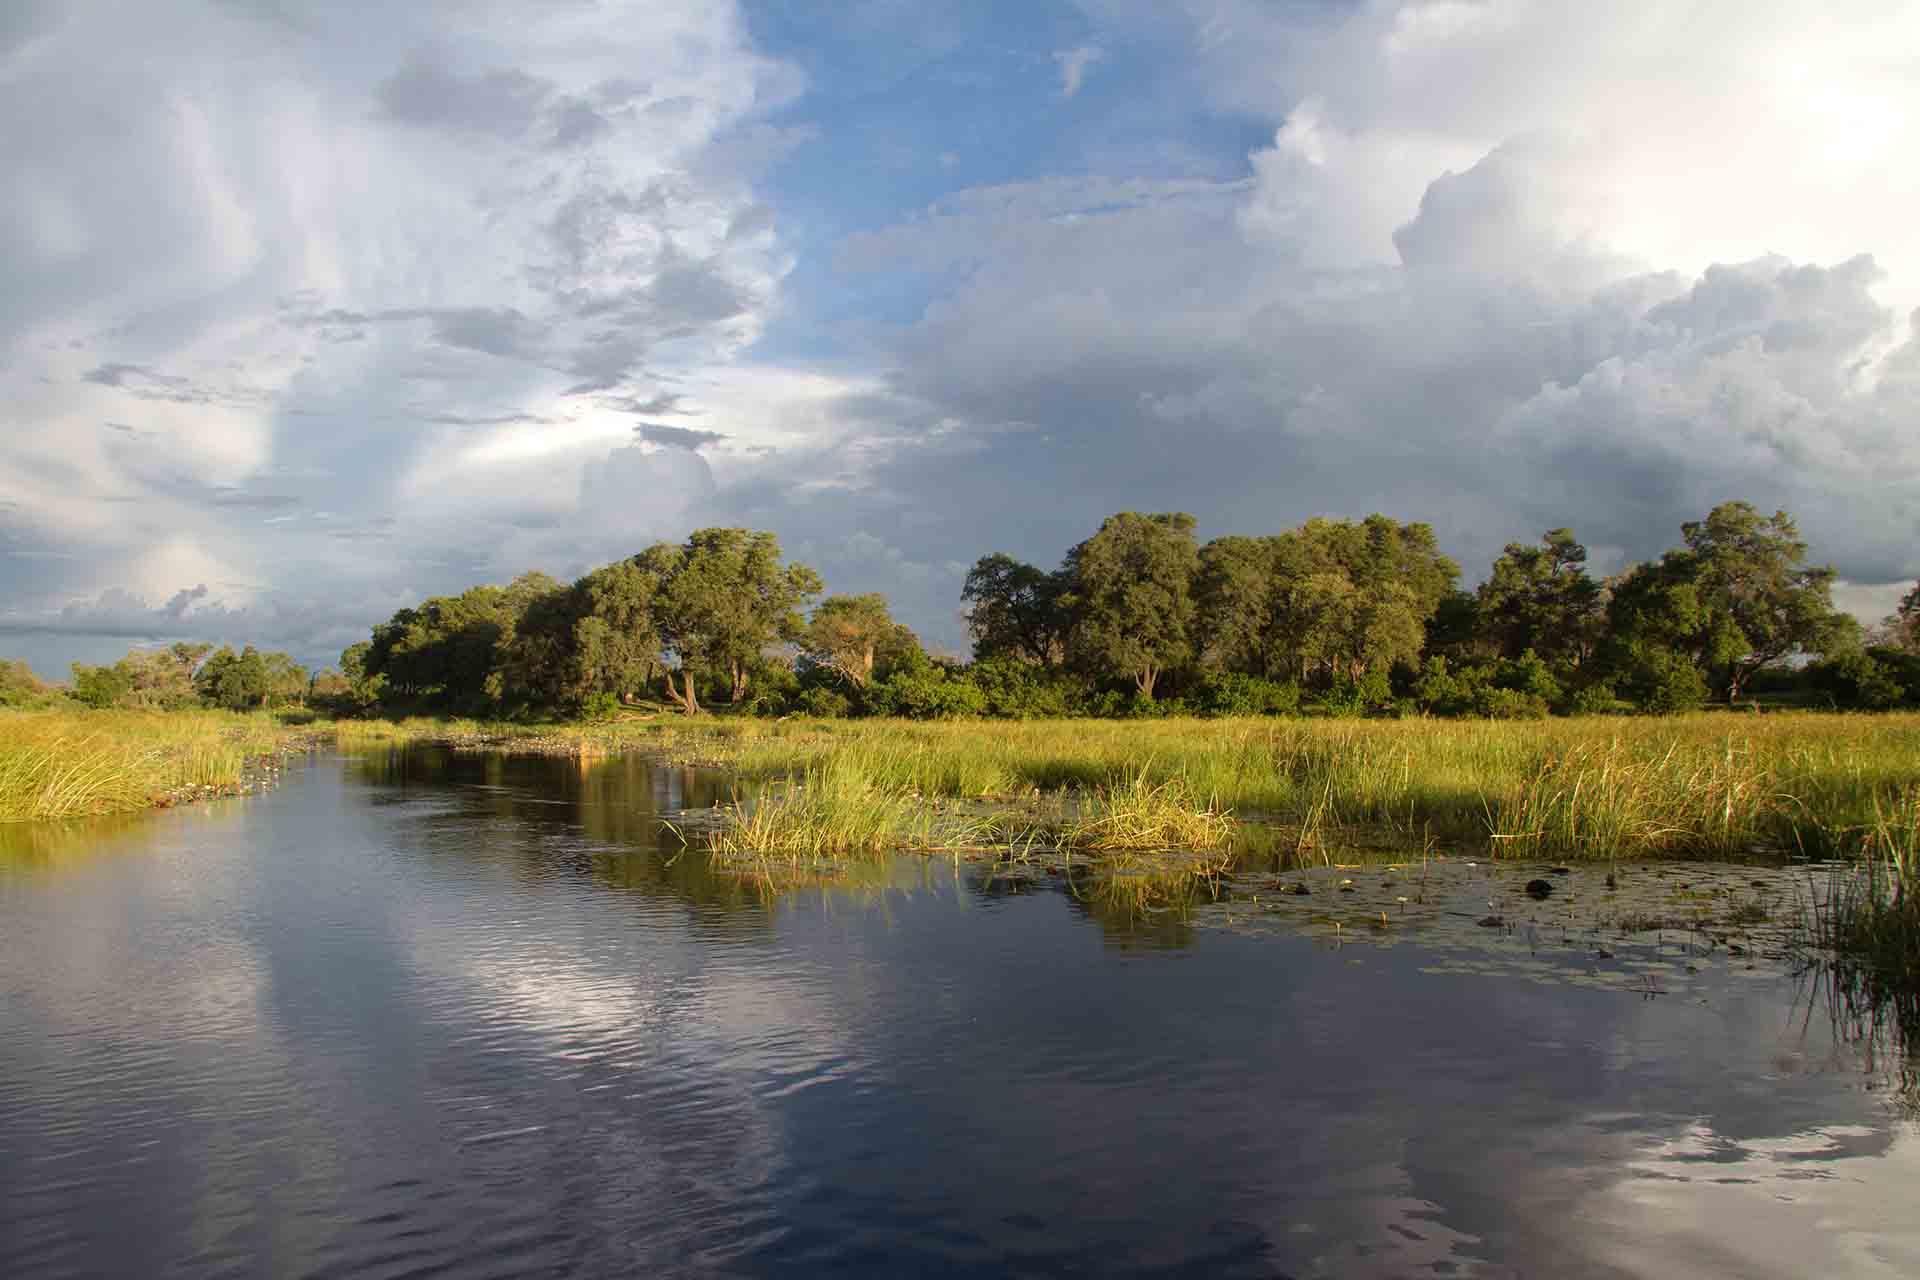 Zambezi - Bande de Caprivi